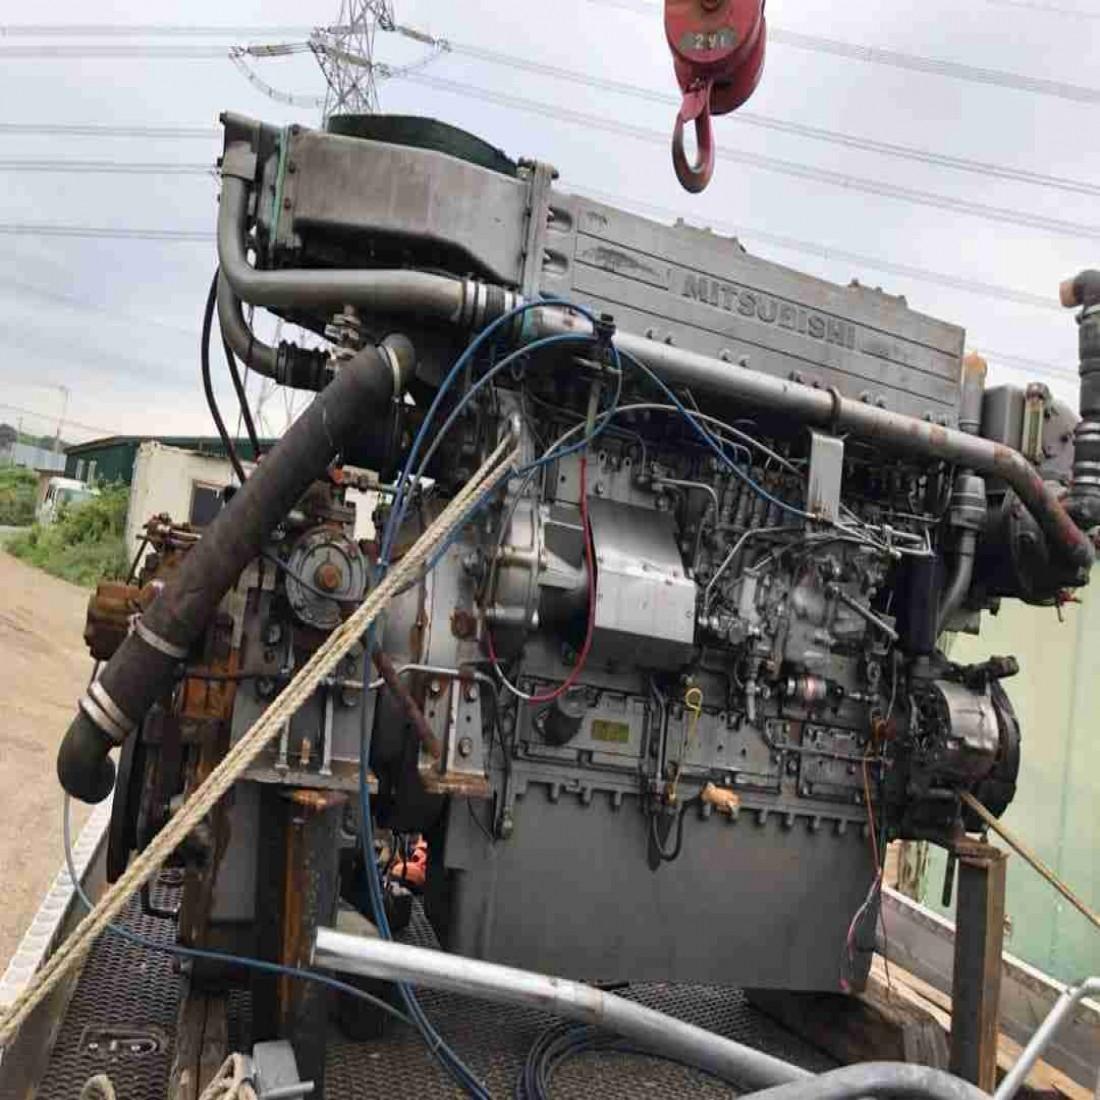 فروش موتور میتسوبیشی 680